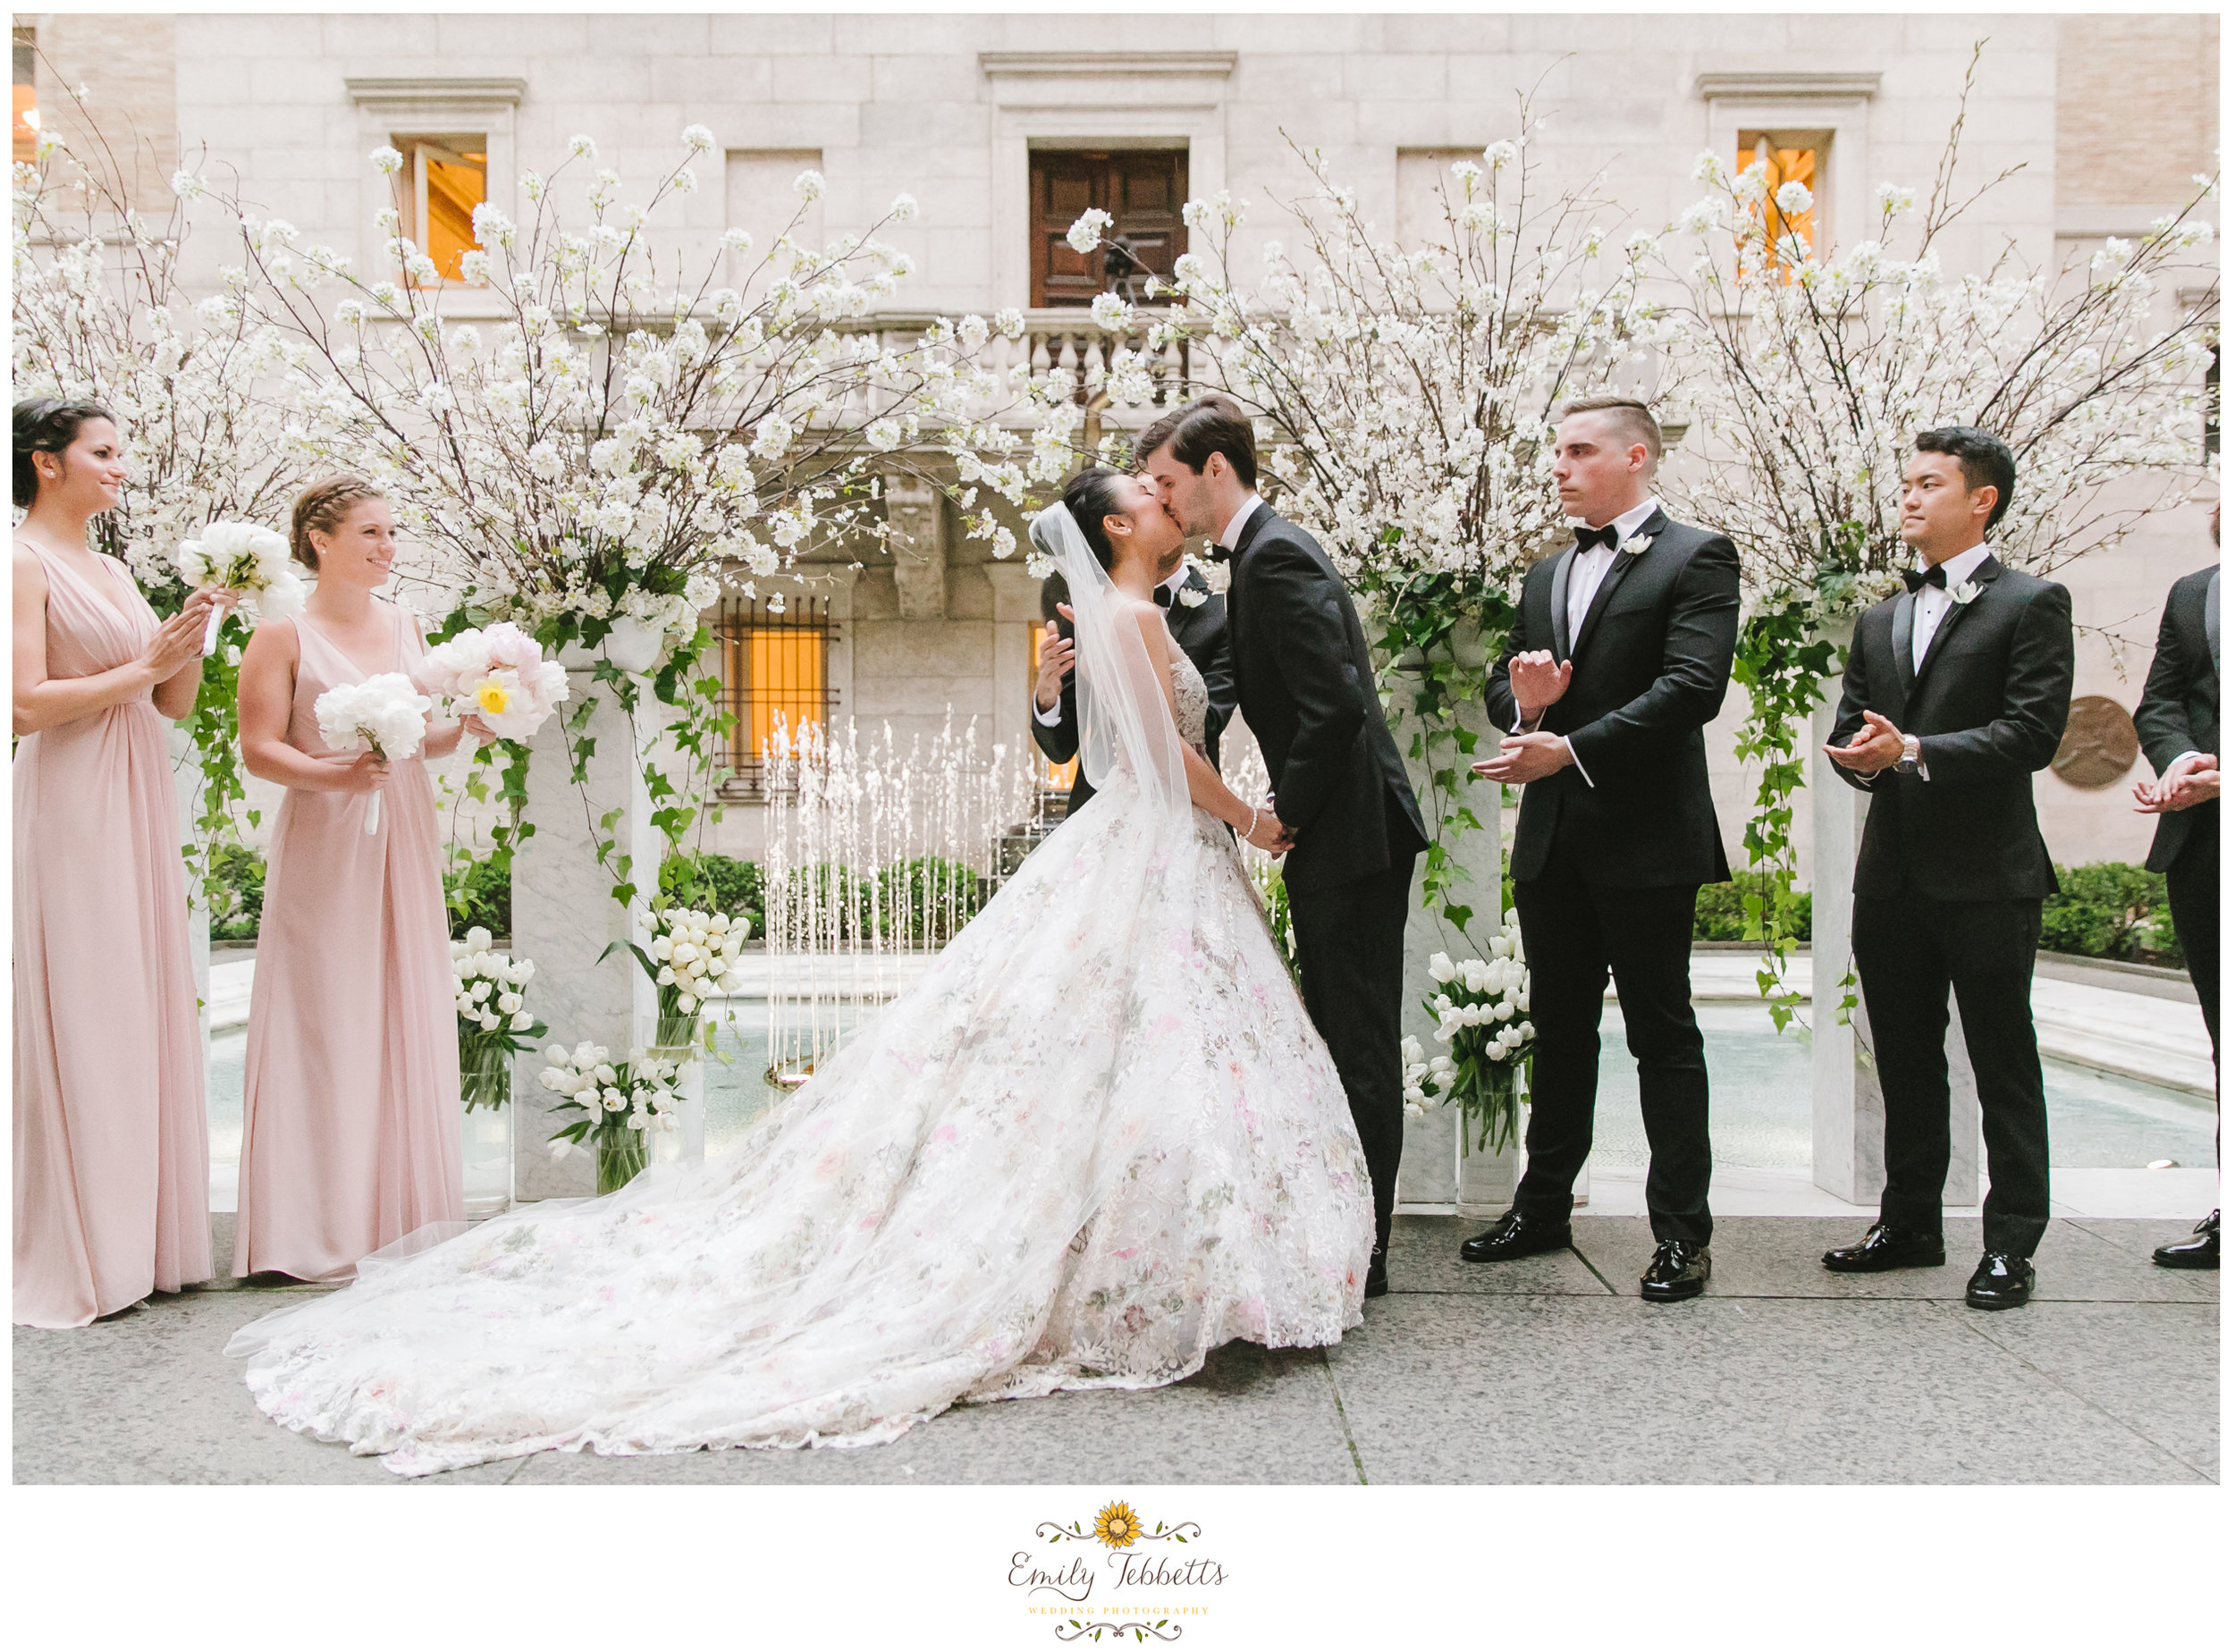 Boston Public Library BPL Wedding Emily Tebbetts Photography - Kaori + John-1-3.jpg